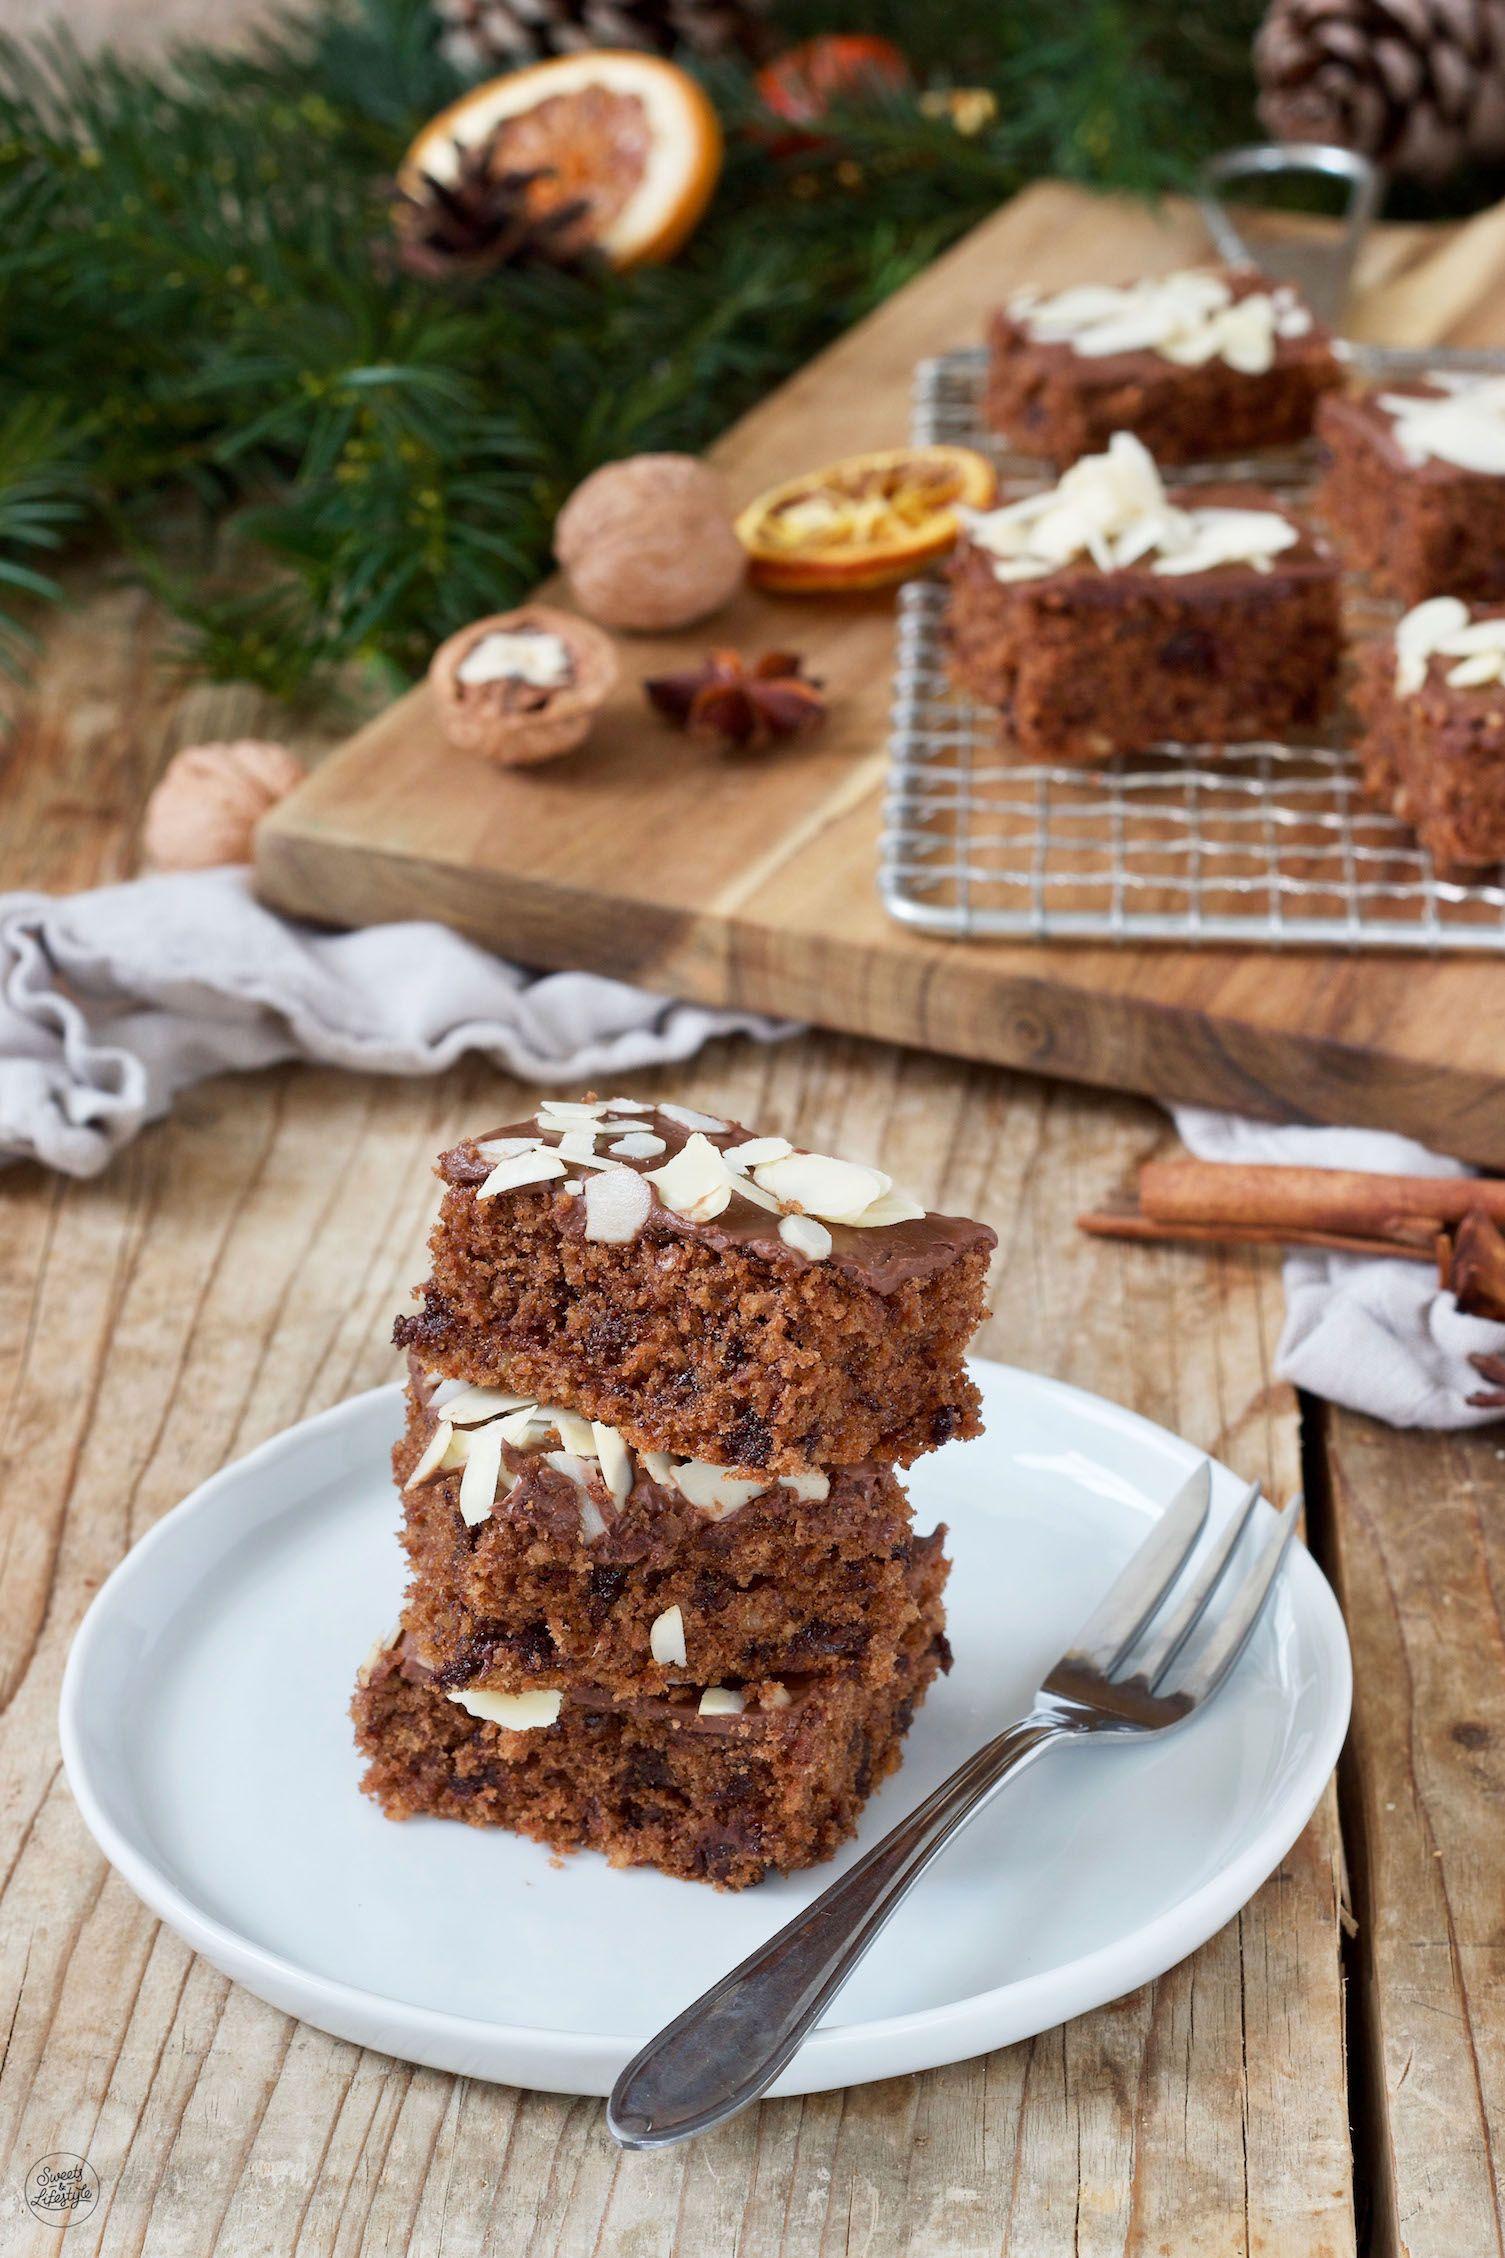 Schokolebkuchen Vom Blech Rezept Sweets Lifestyle Rezept Rezepte Kuchen Und Torten Schoko Lebkuchen